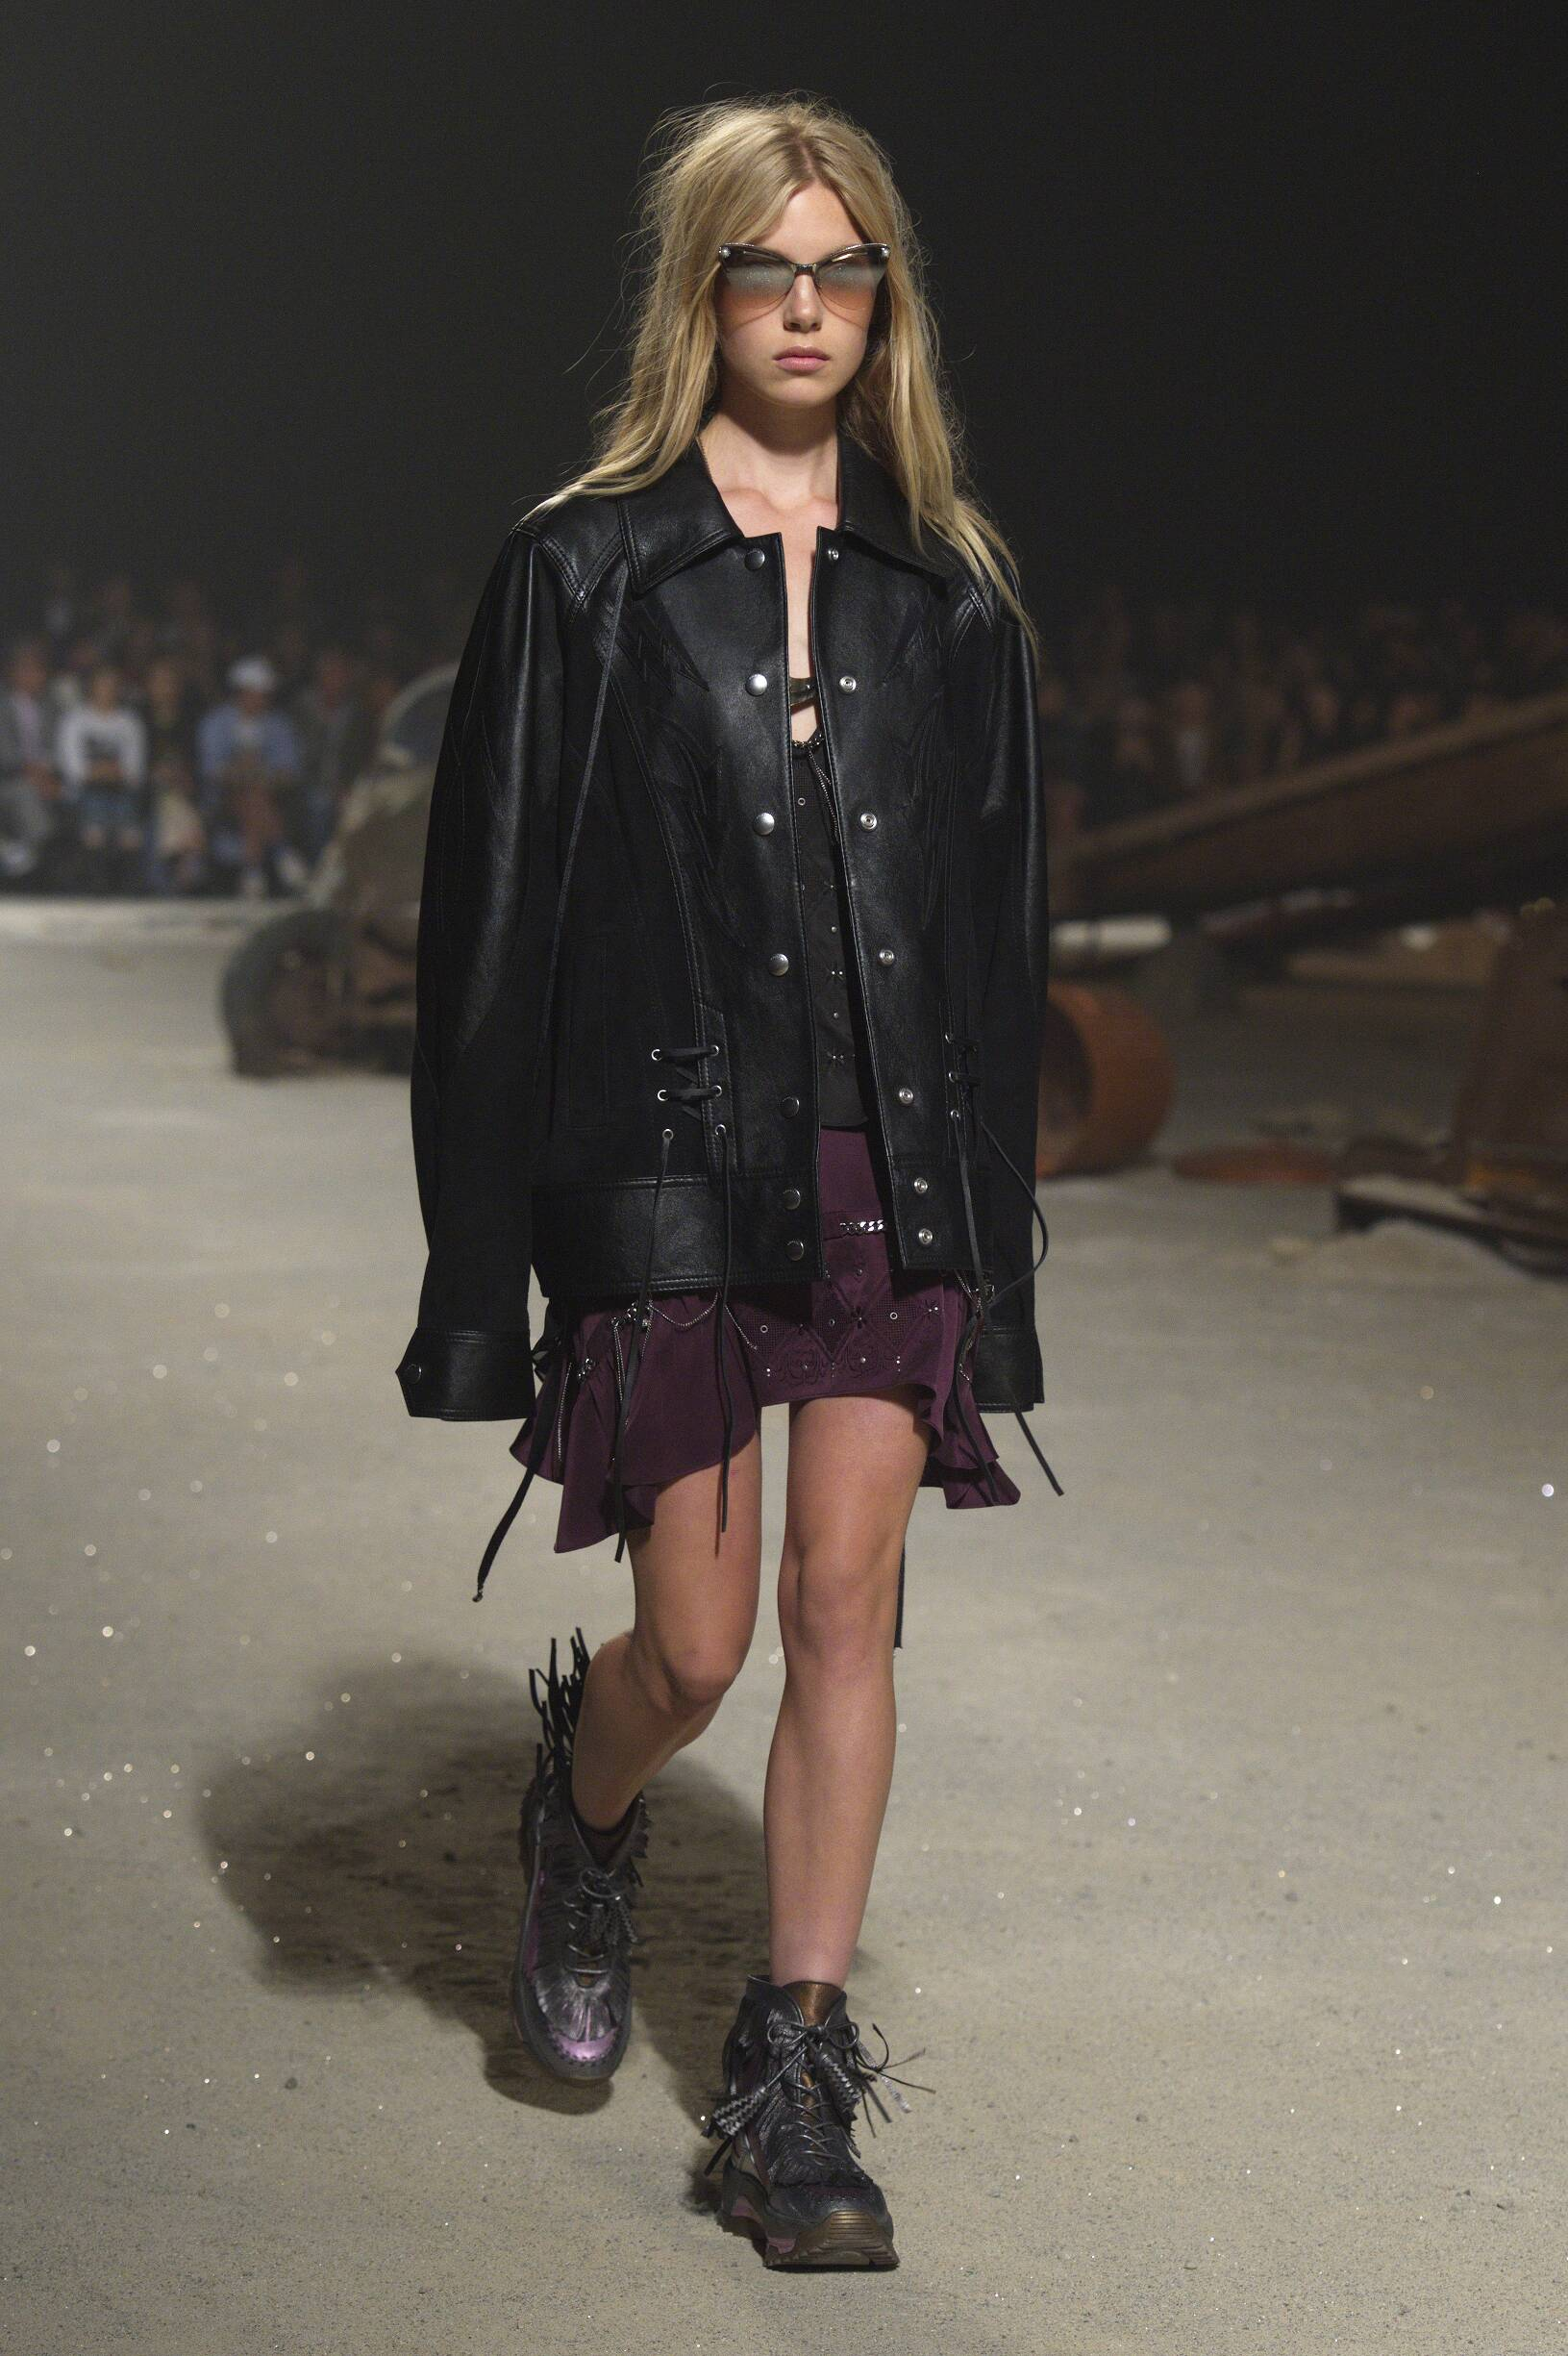 Spring Summer Fashion Trends 2019 Coach